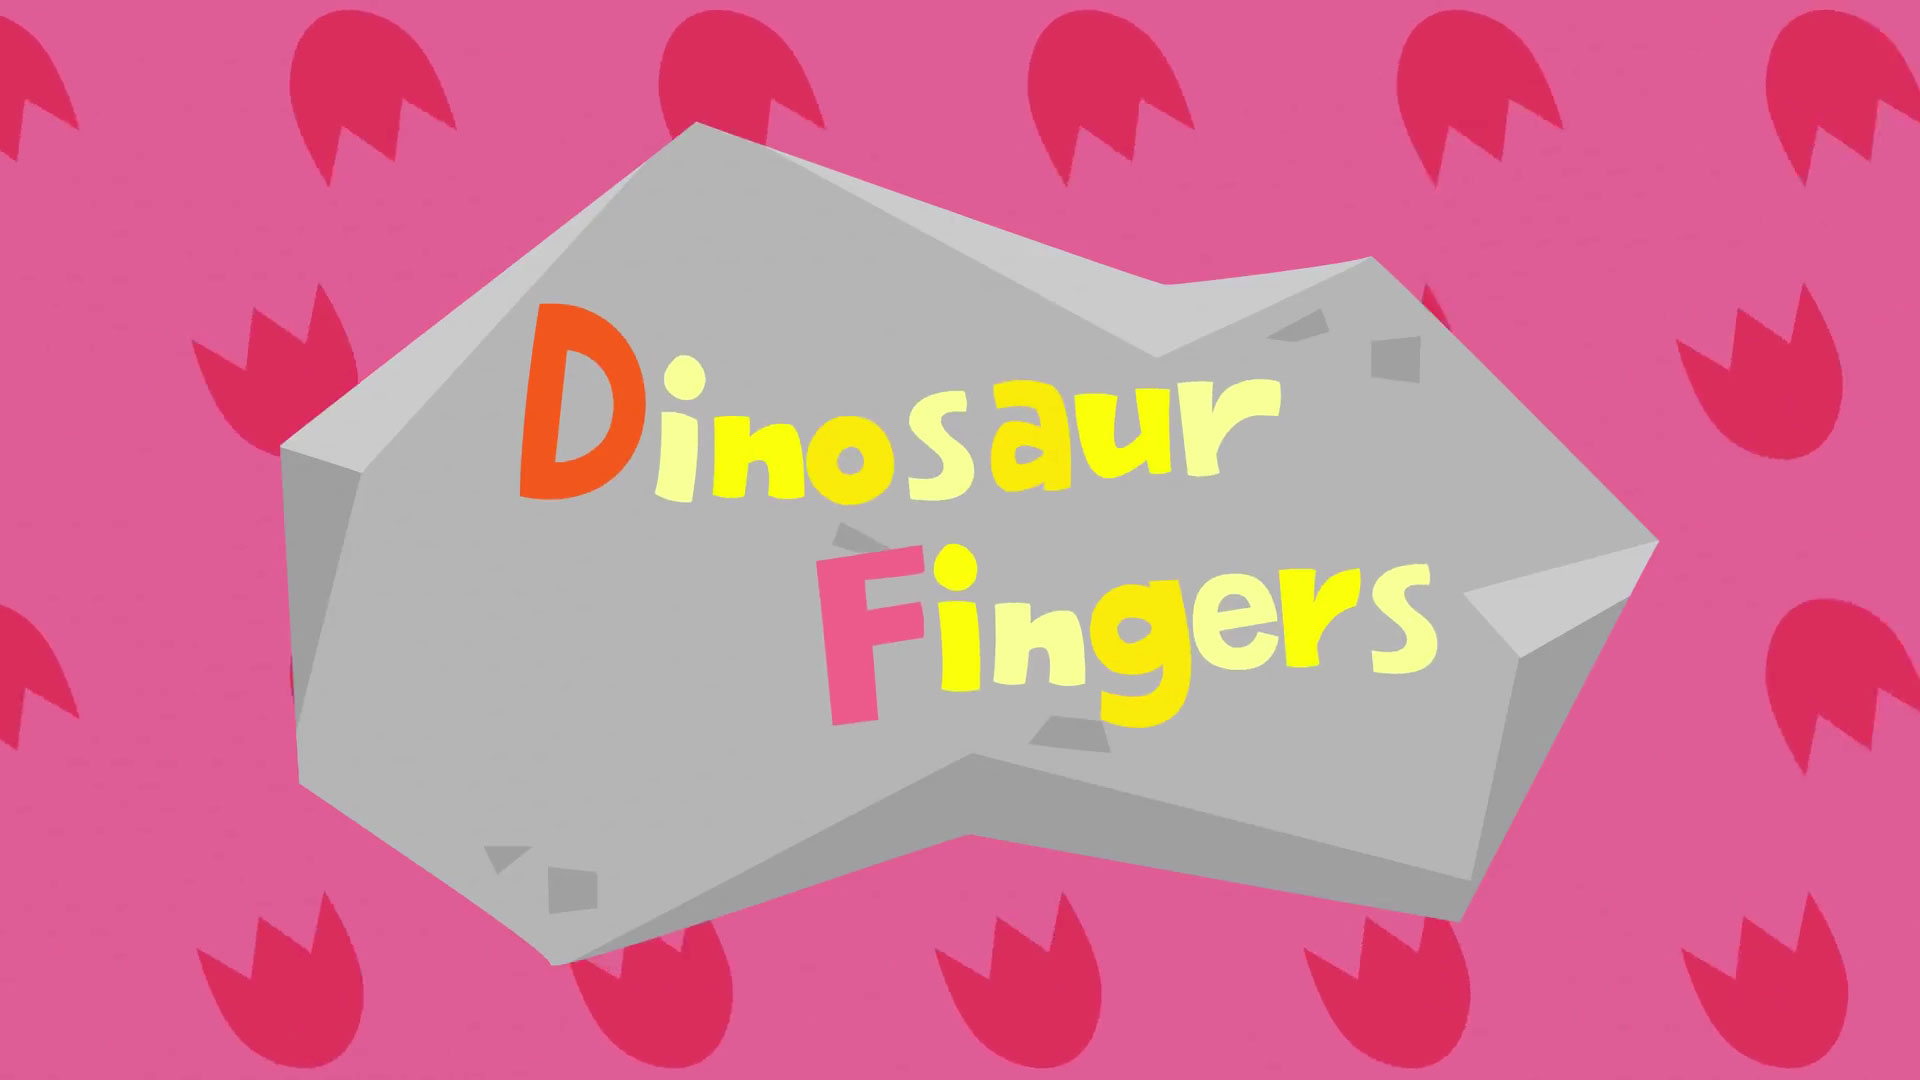 KizCastle《Dinosaur Songs 恐龙儿歌》视频动画全16集下载 mp4英语1080p 百度云网盘